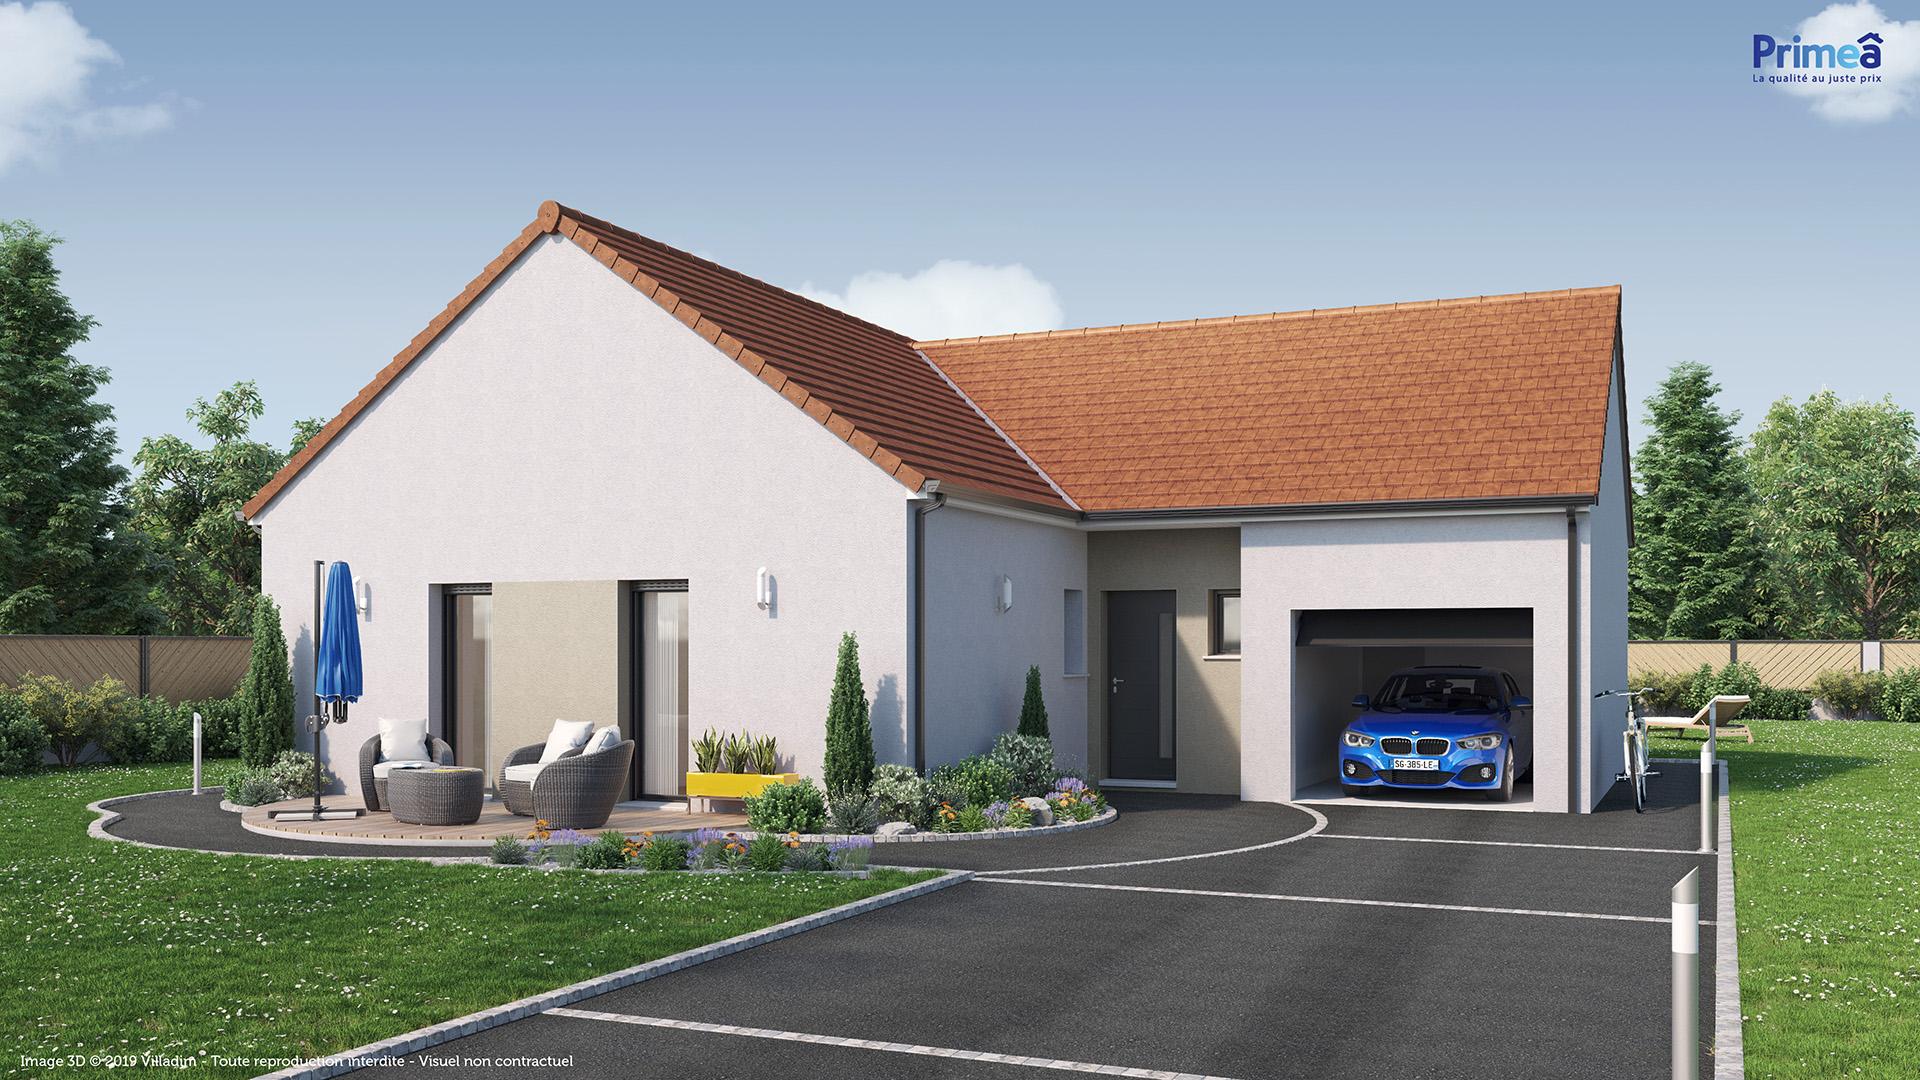 Maison à vendre à Perrigny-lès-Dijon